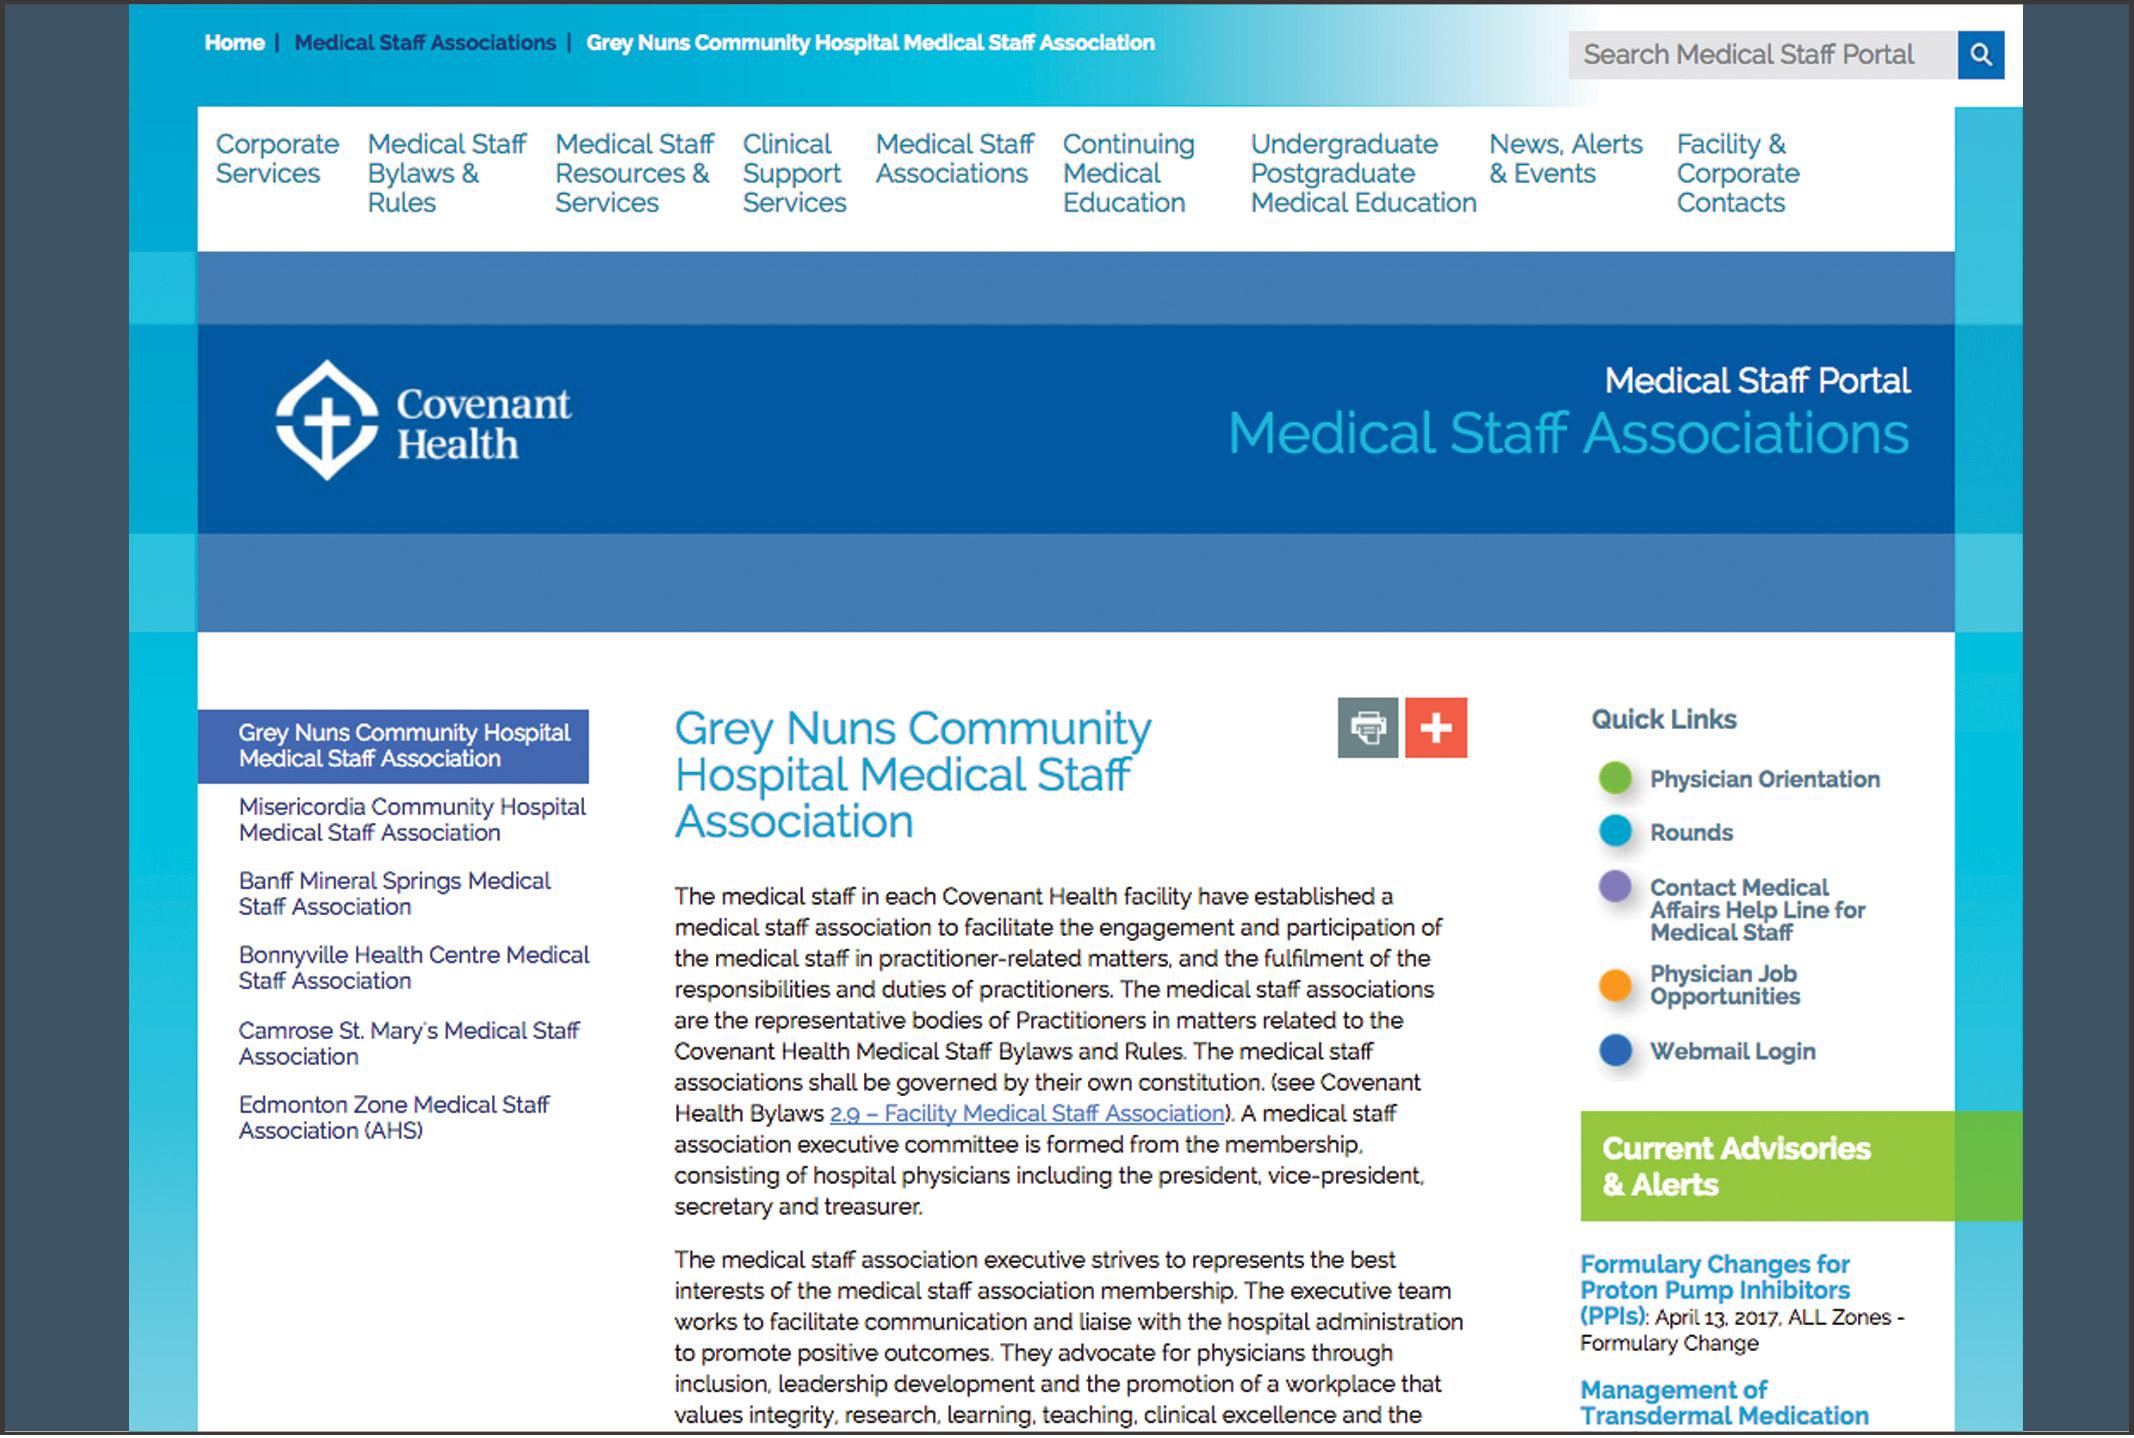 Medical staff portal